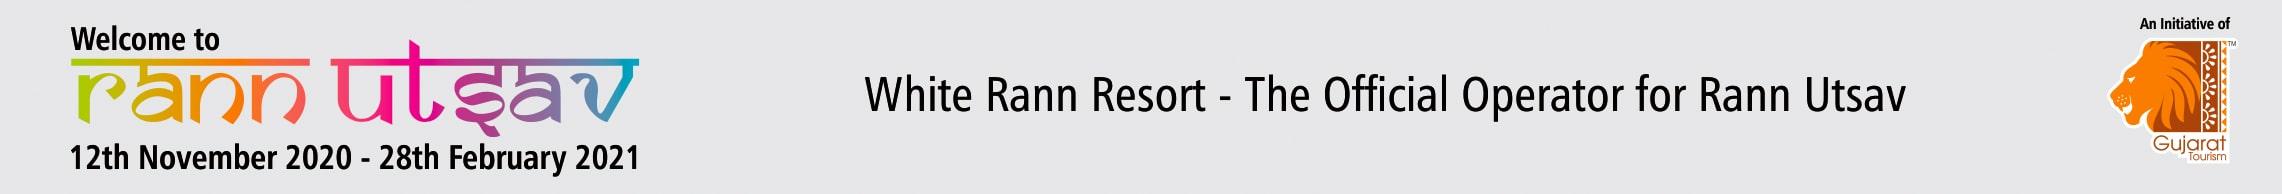 Rann Utsav, Kutch Rann Utsav 2020-2021 | Rann Utsav, Kutch Rann Utsav 2020-2021   Rann Utsav 2018